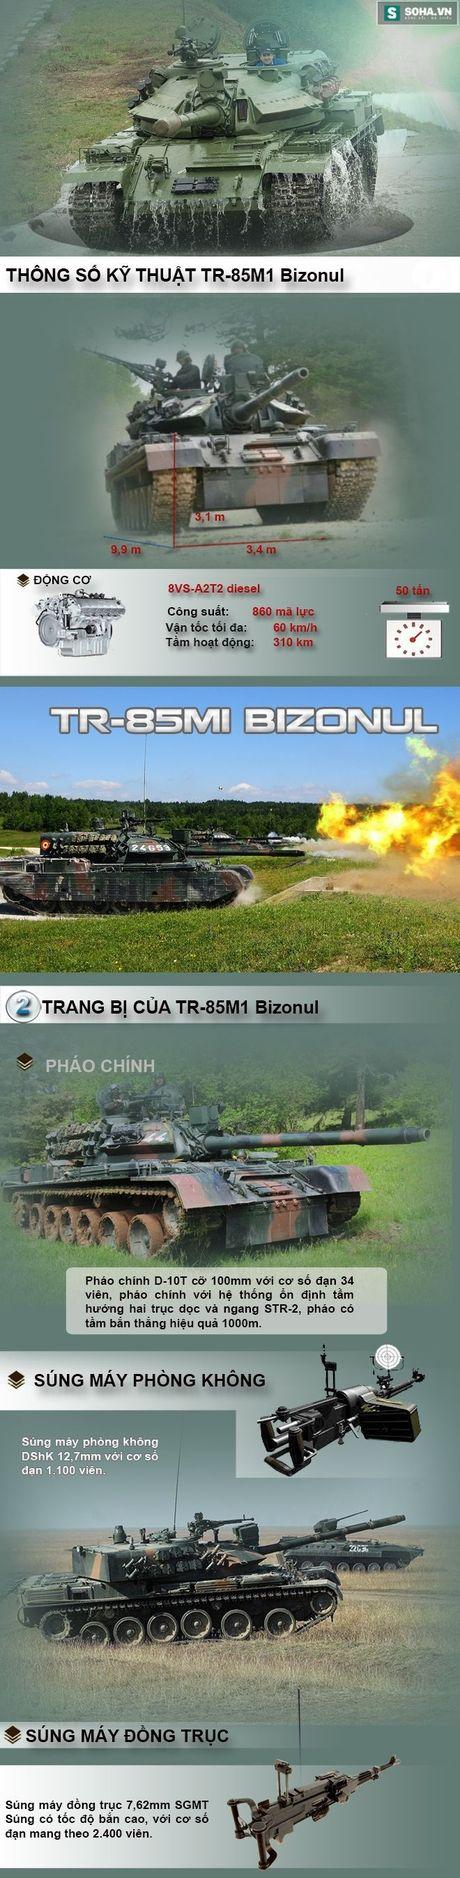 Ban nang cap cuc manh cua xe tang T-55 da tung danh bai M1 Abrams - Anh 2